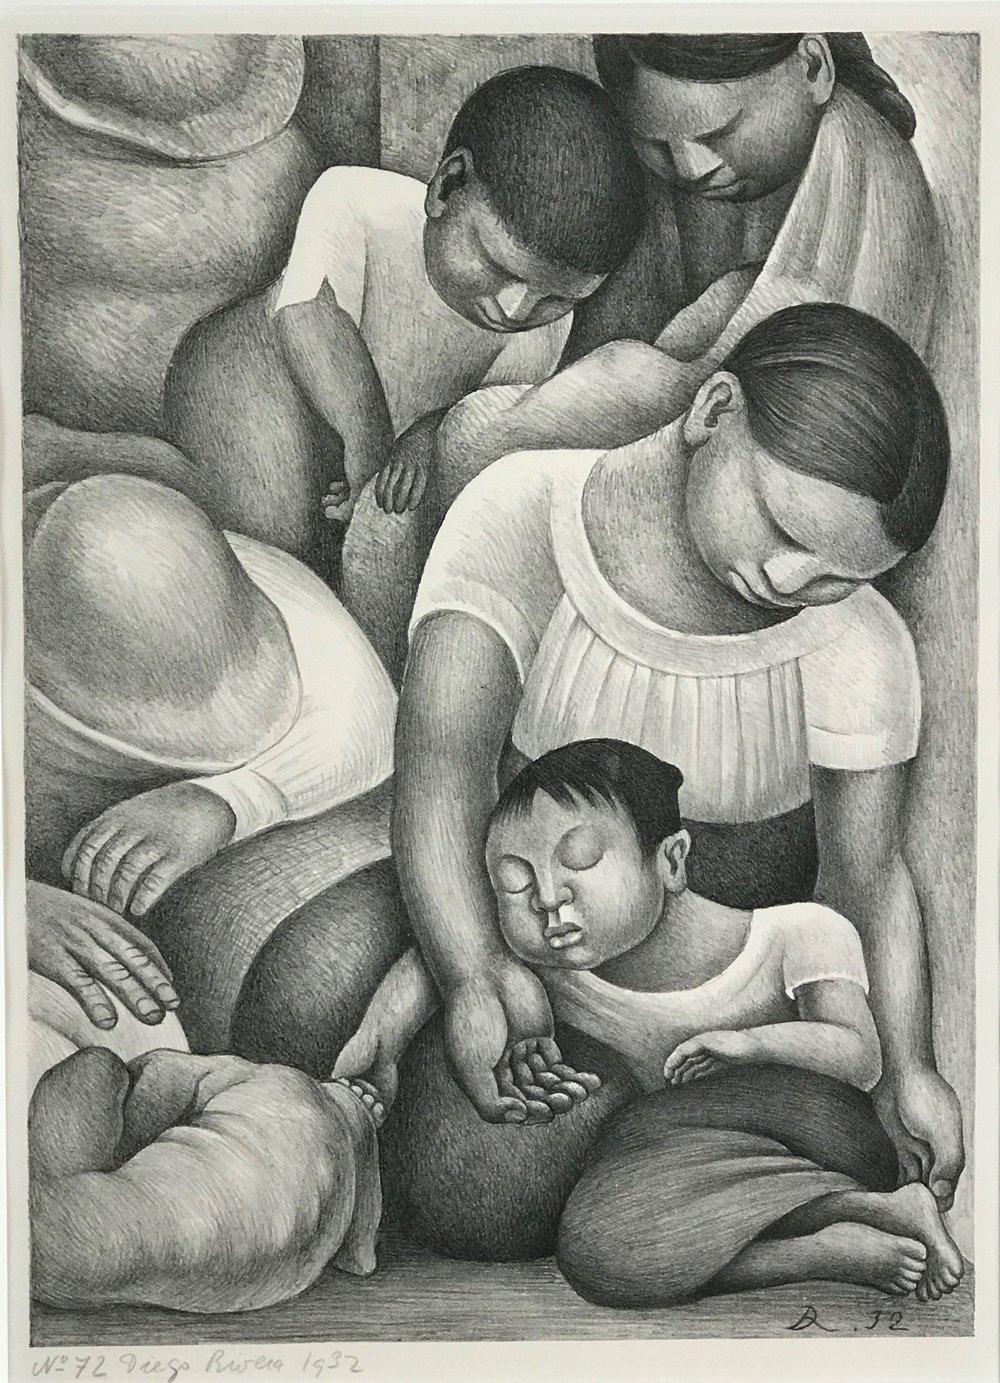 Diego Rivera  Lithograph.  Sleeping Children.  1932  16.25 x 12 inches .jpg